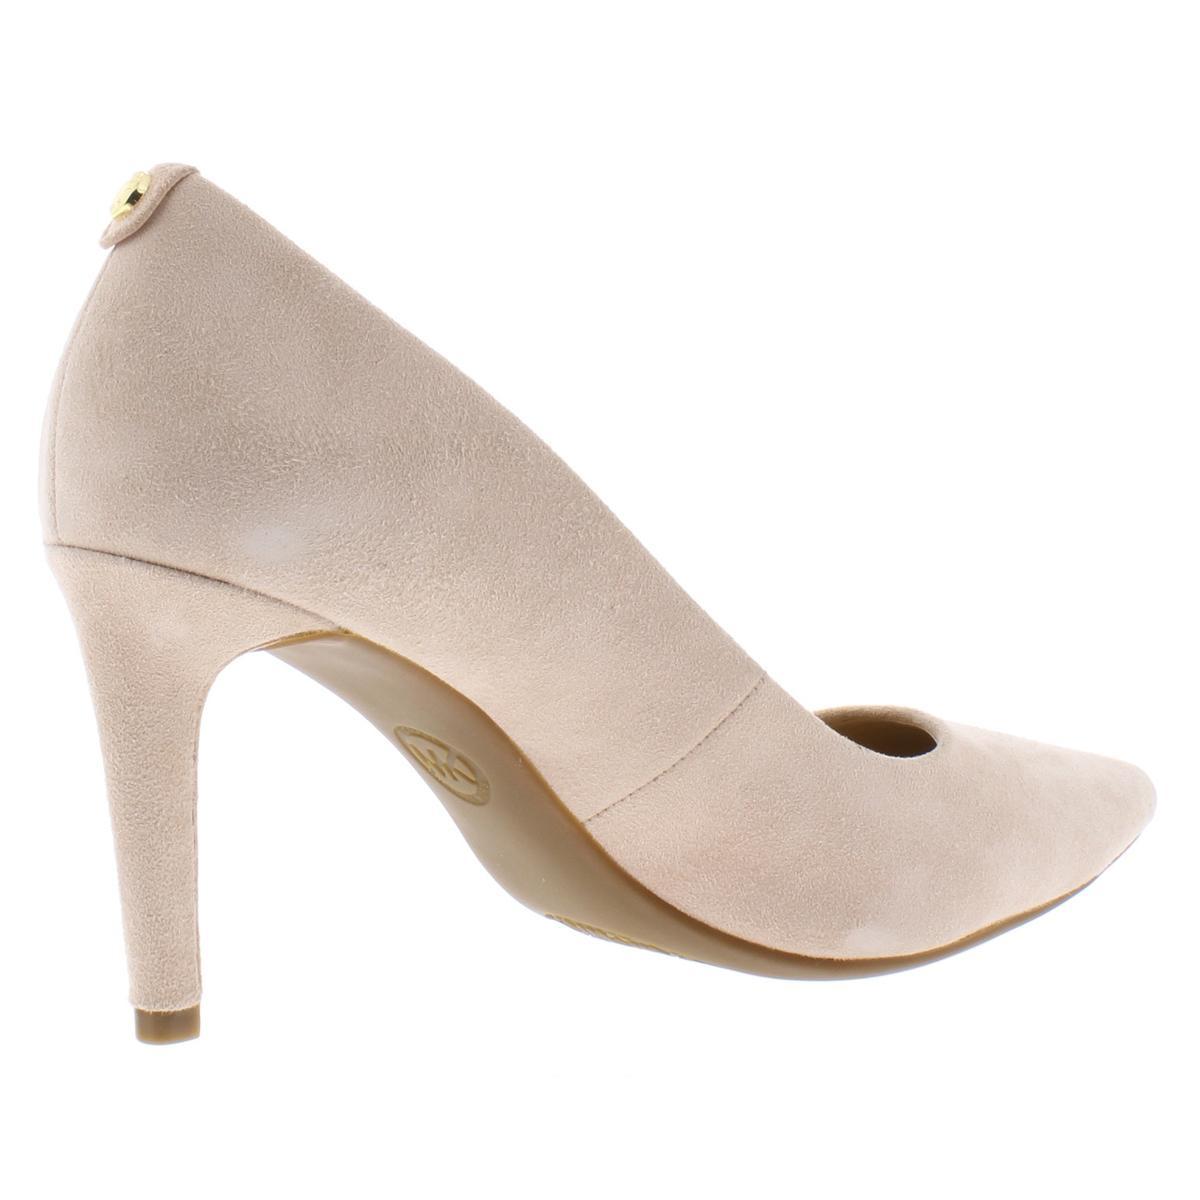 MICHAEL-Michael-Kors-Womens-Dorothy-Suede-Pumps-Dress-Heels-Shoes-BHFO-6408 thumbnail 10